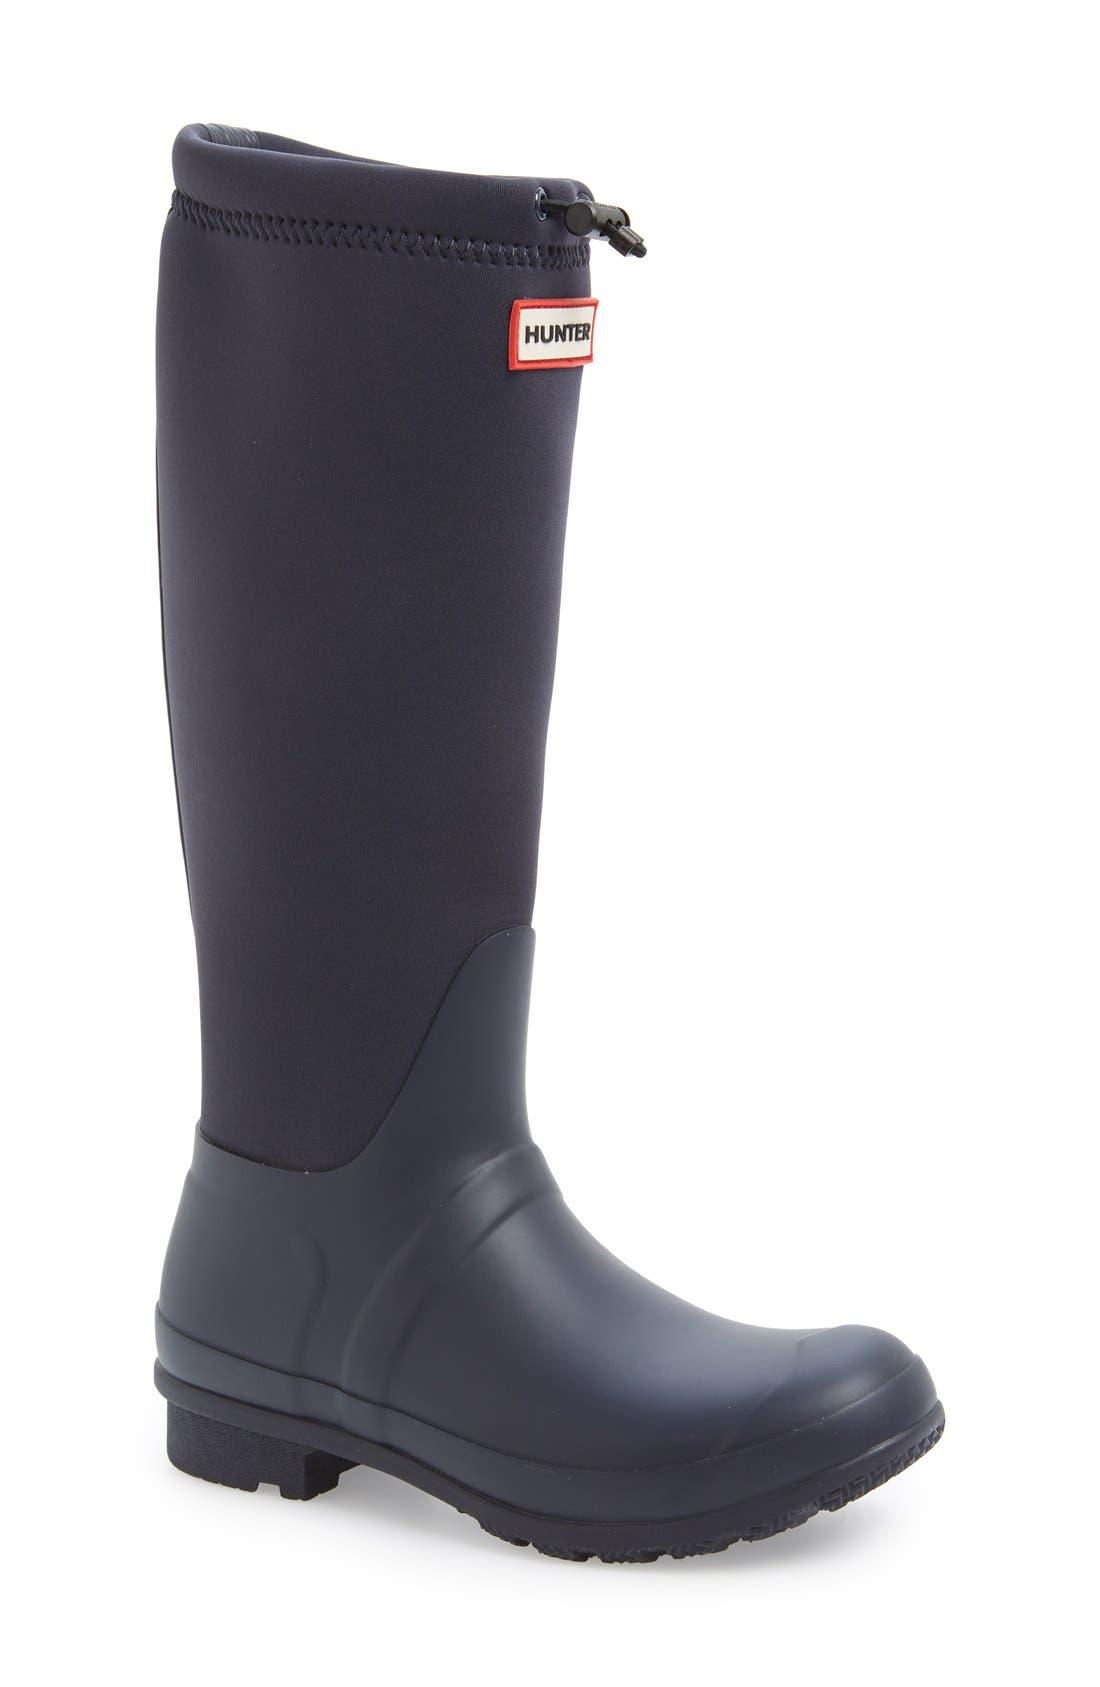 Alternate Image 1 Selected - Hunter 'Original Tour' Neoprene Waterproof Boot (Women)